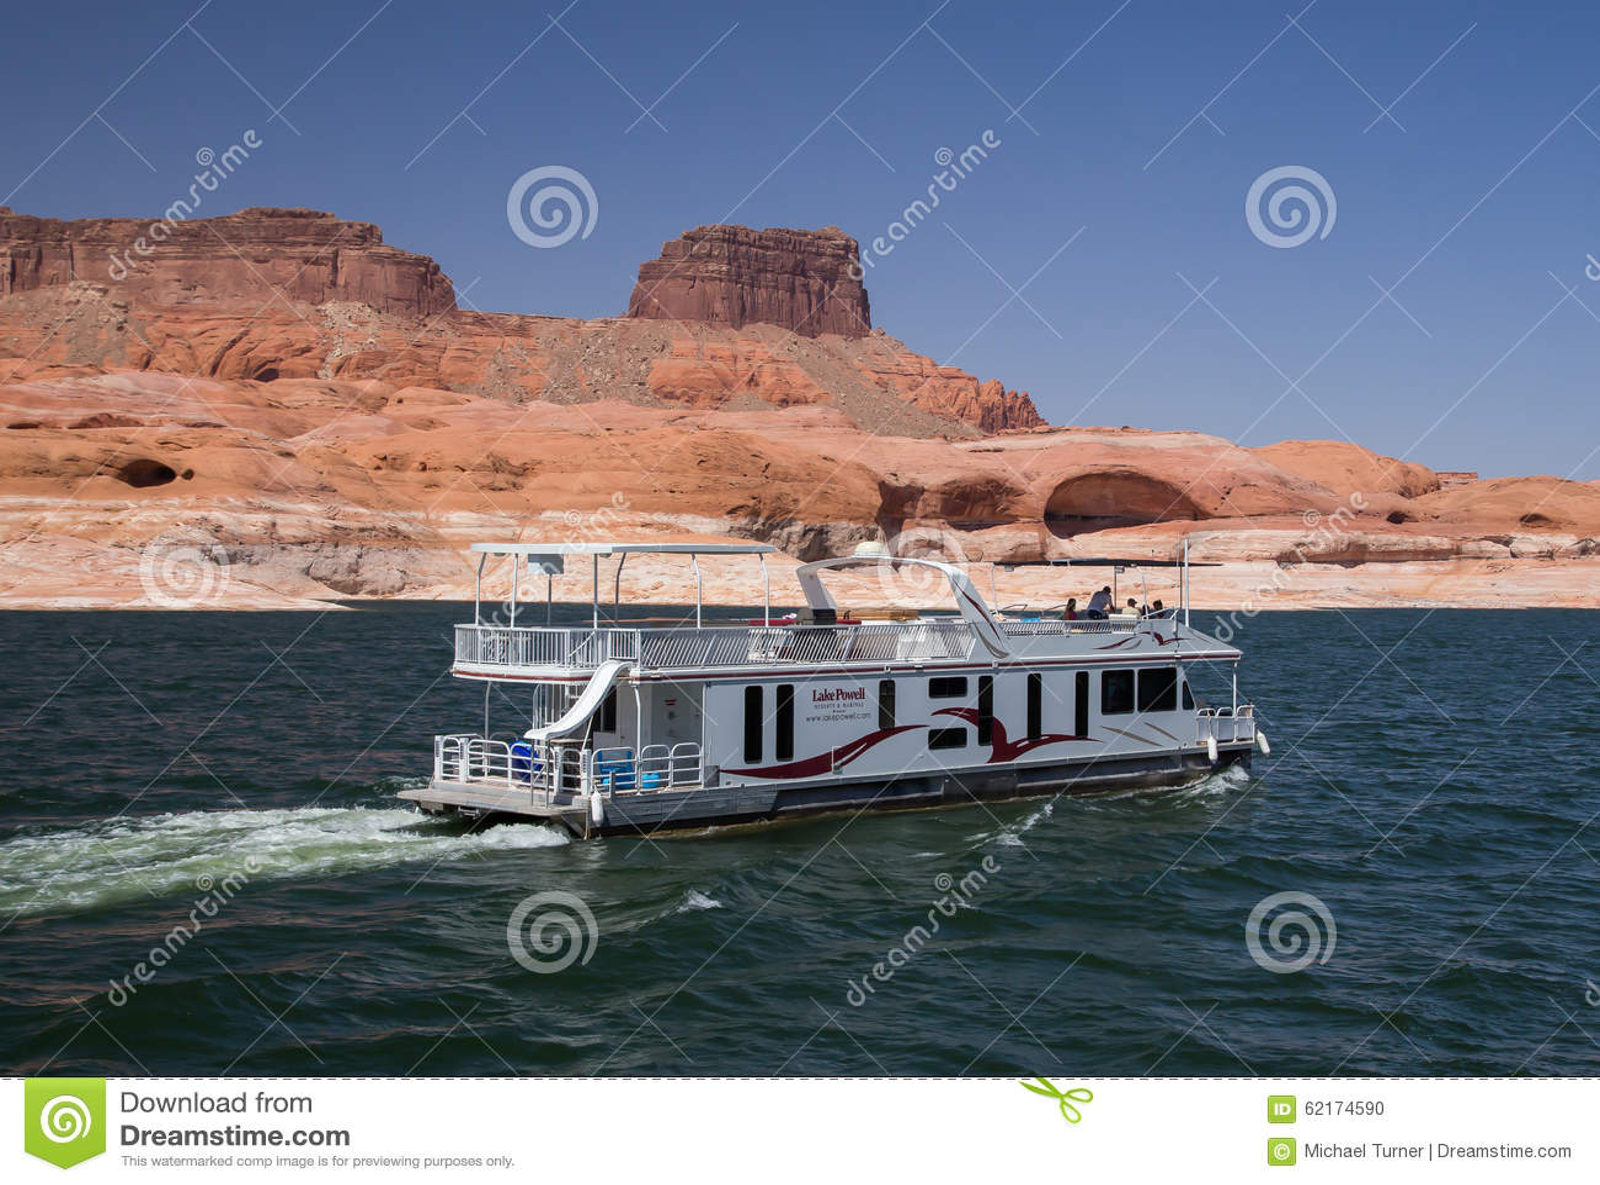 Houseboat On Lake Powell Editorial Image Image Of Pleasure 62174590